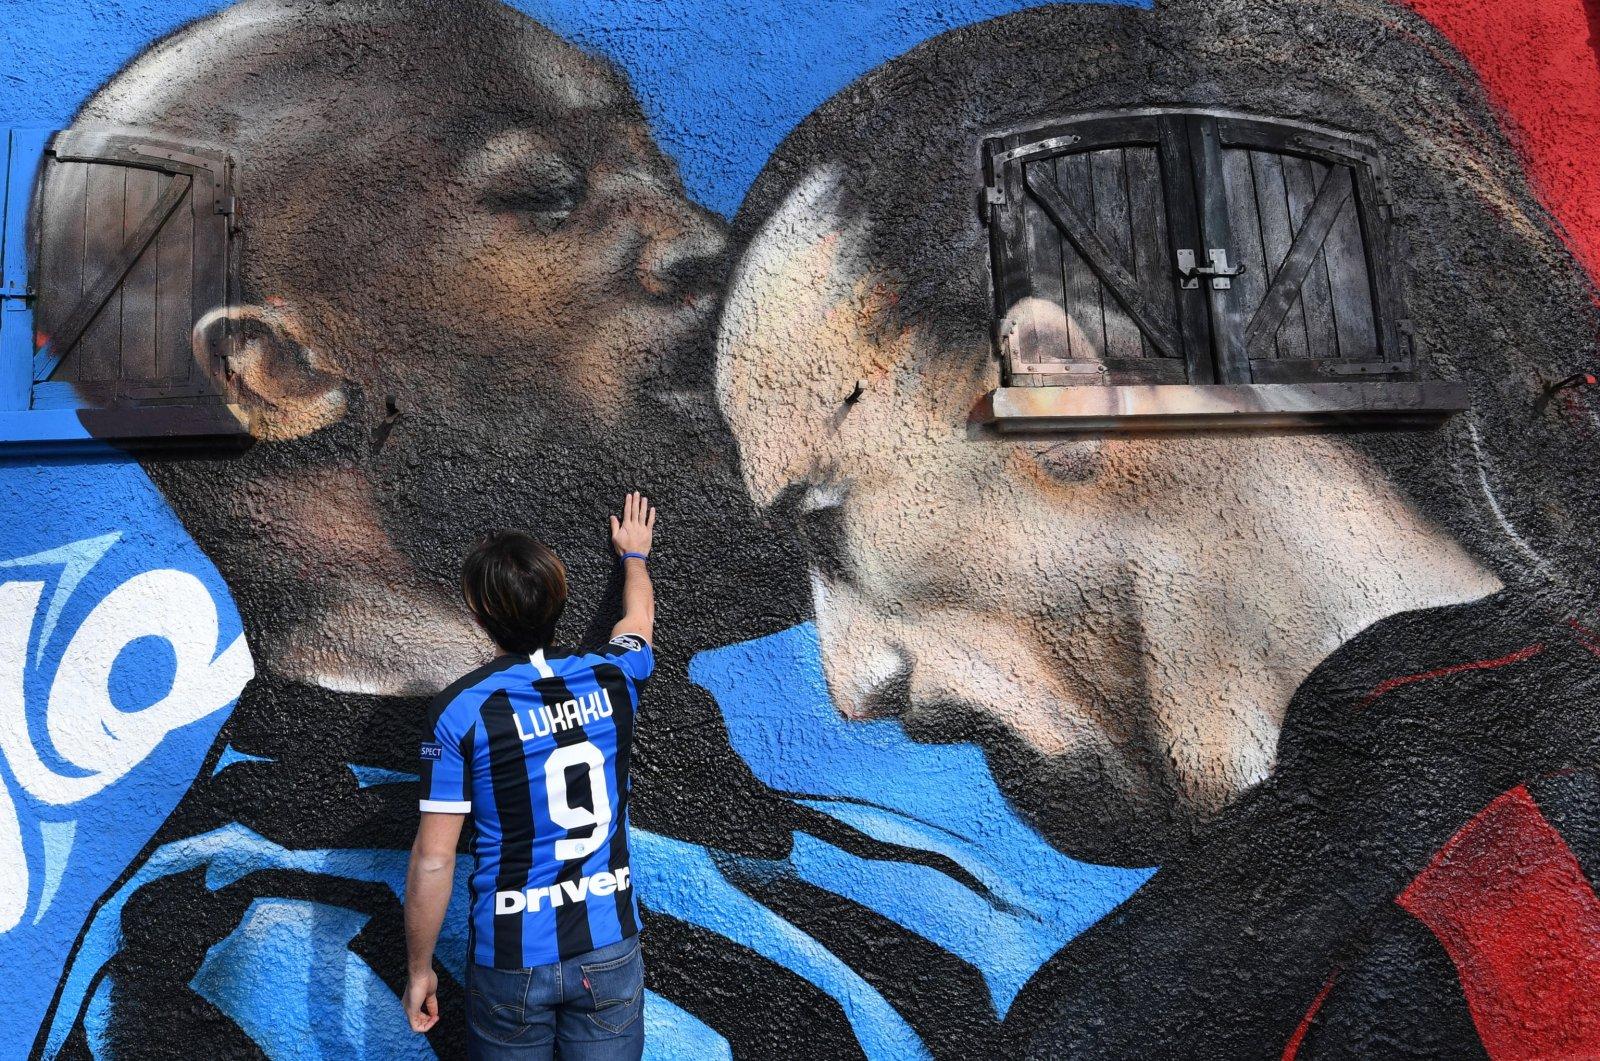 An Inter supporter touches a mural near the Giuseppe Meazza Stadium, depicting Inter Milan's Romelu Lukaku (L) and AC Milan's Zlatan Ibrahimovic during an Italian Cup match, in Milan, Italy, Feb. 15, 2021. (EPA Photo)